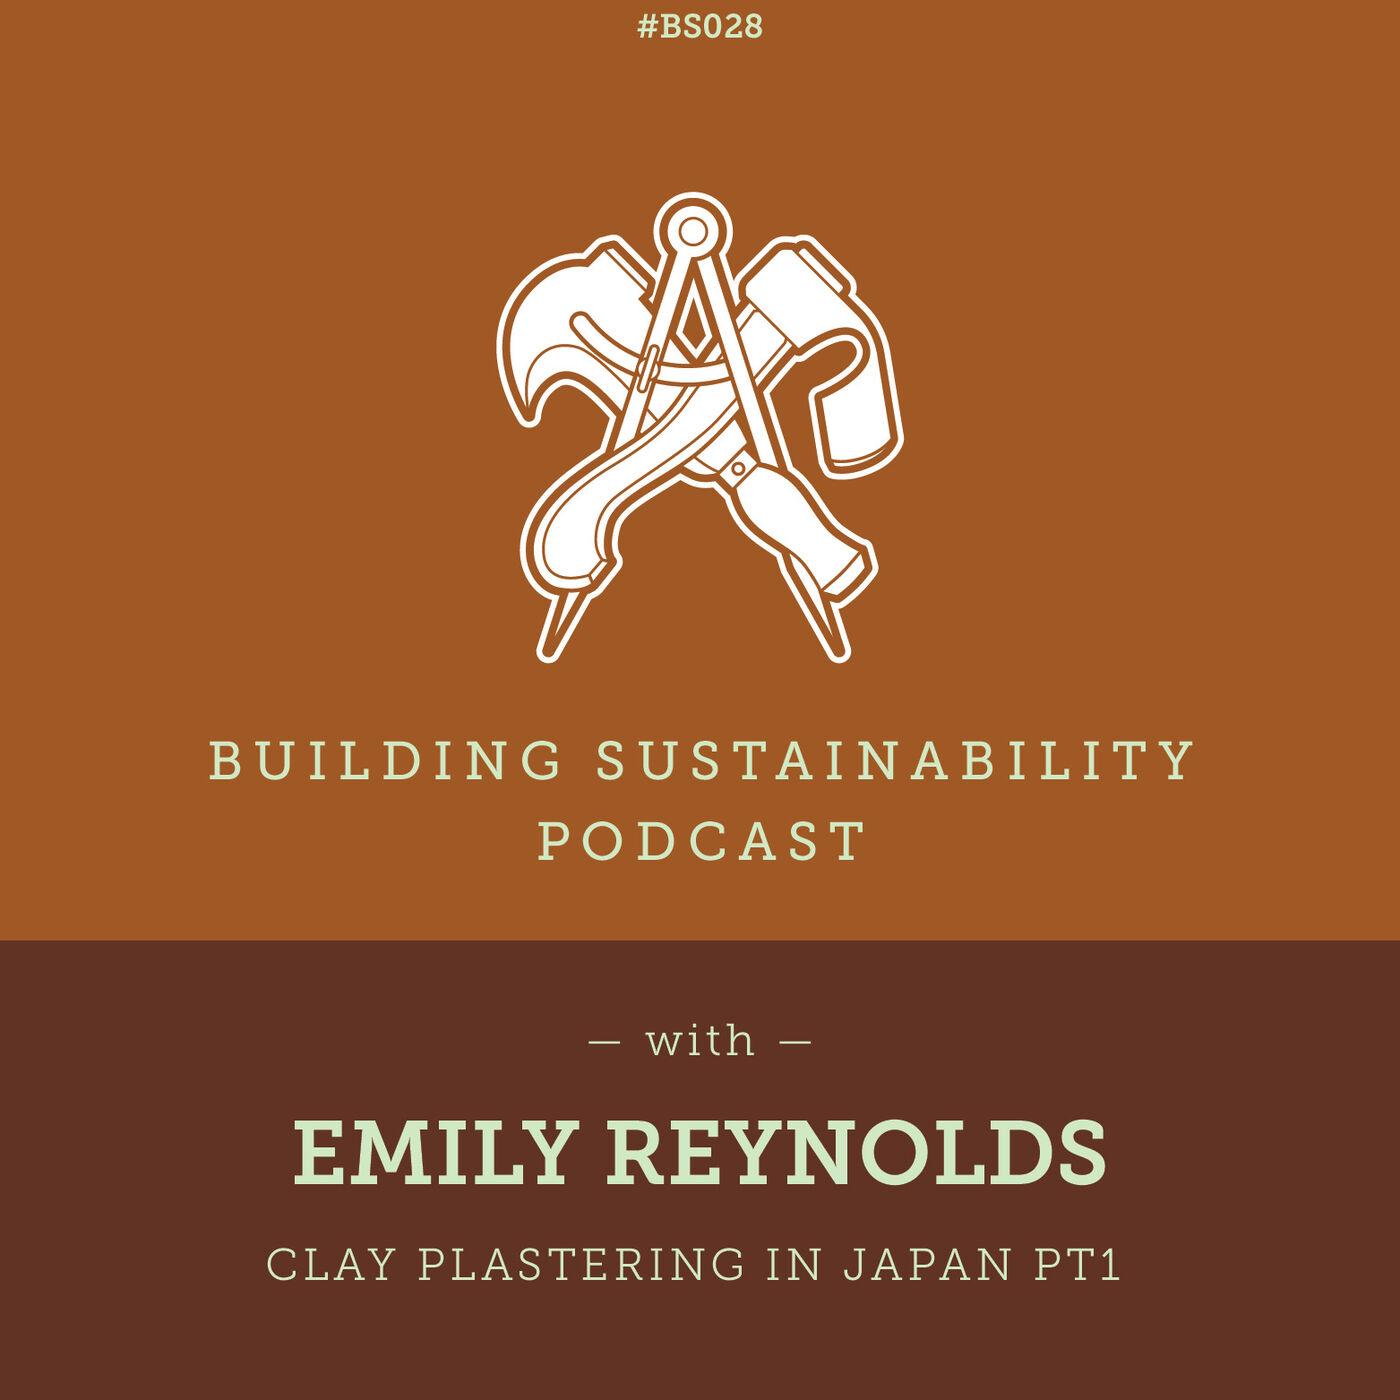 Clay plastering in Japan Pt2 - Emily Reynolds - BS028